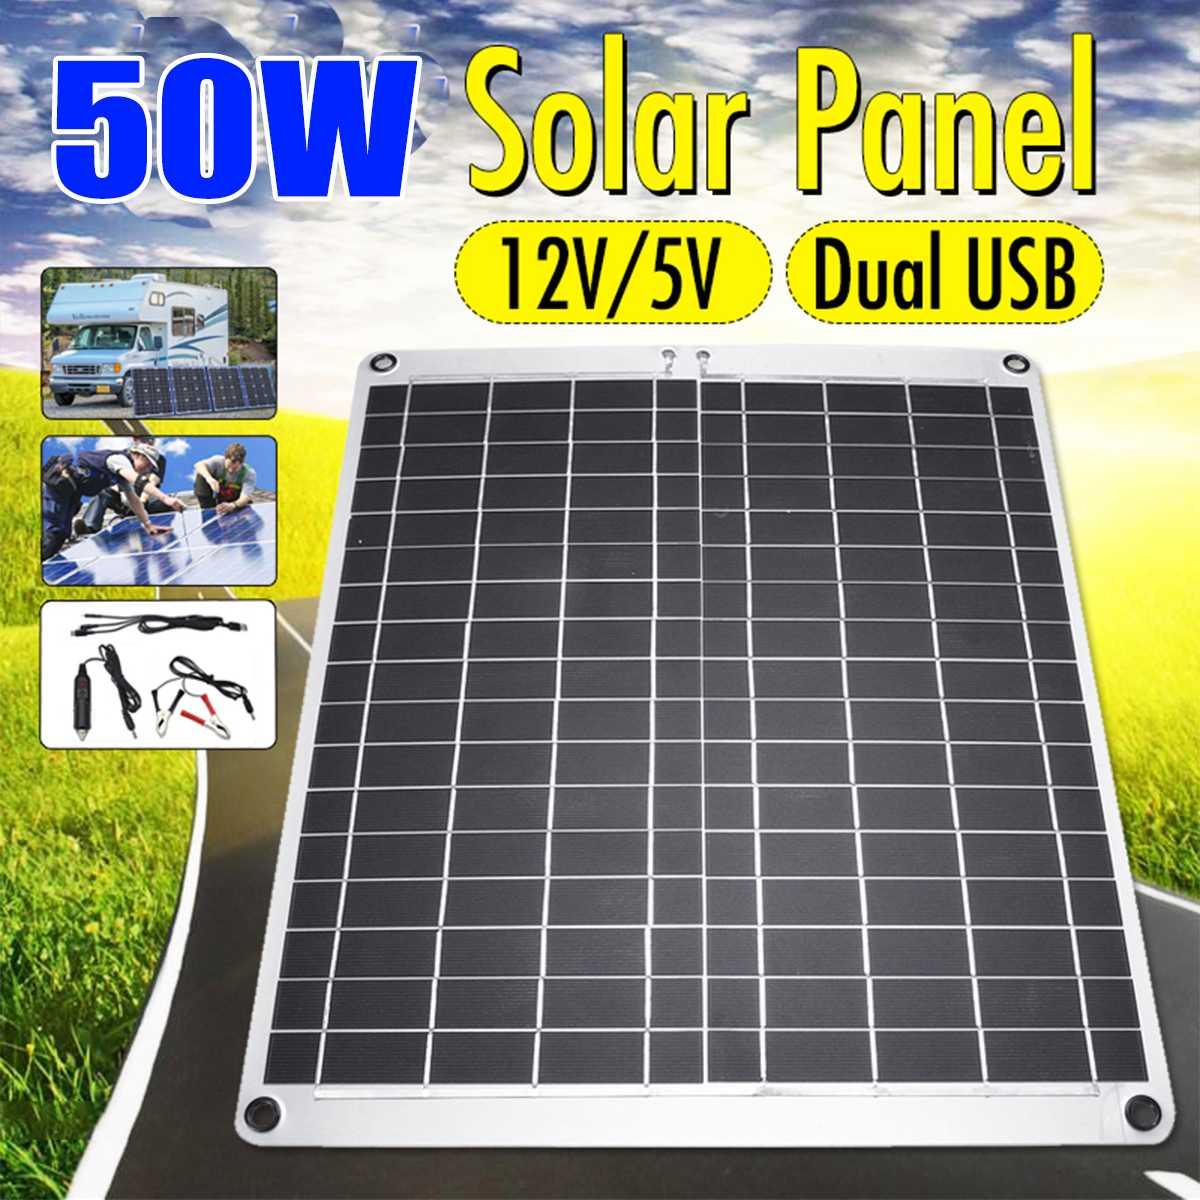 50W Solar Panel Dual USB 12V/5V Monocrystaline Flexible Solar Cells Waterproof Solar Charger For Car RV Yacht Battery Boat